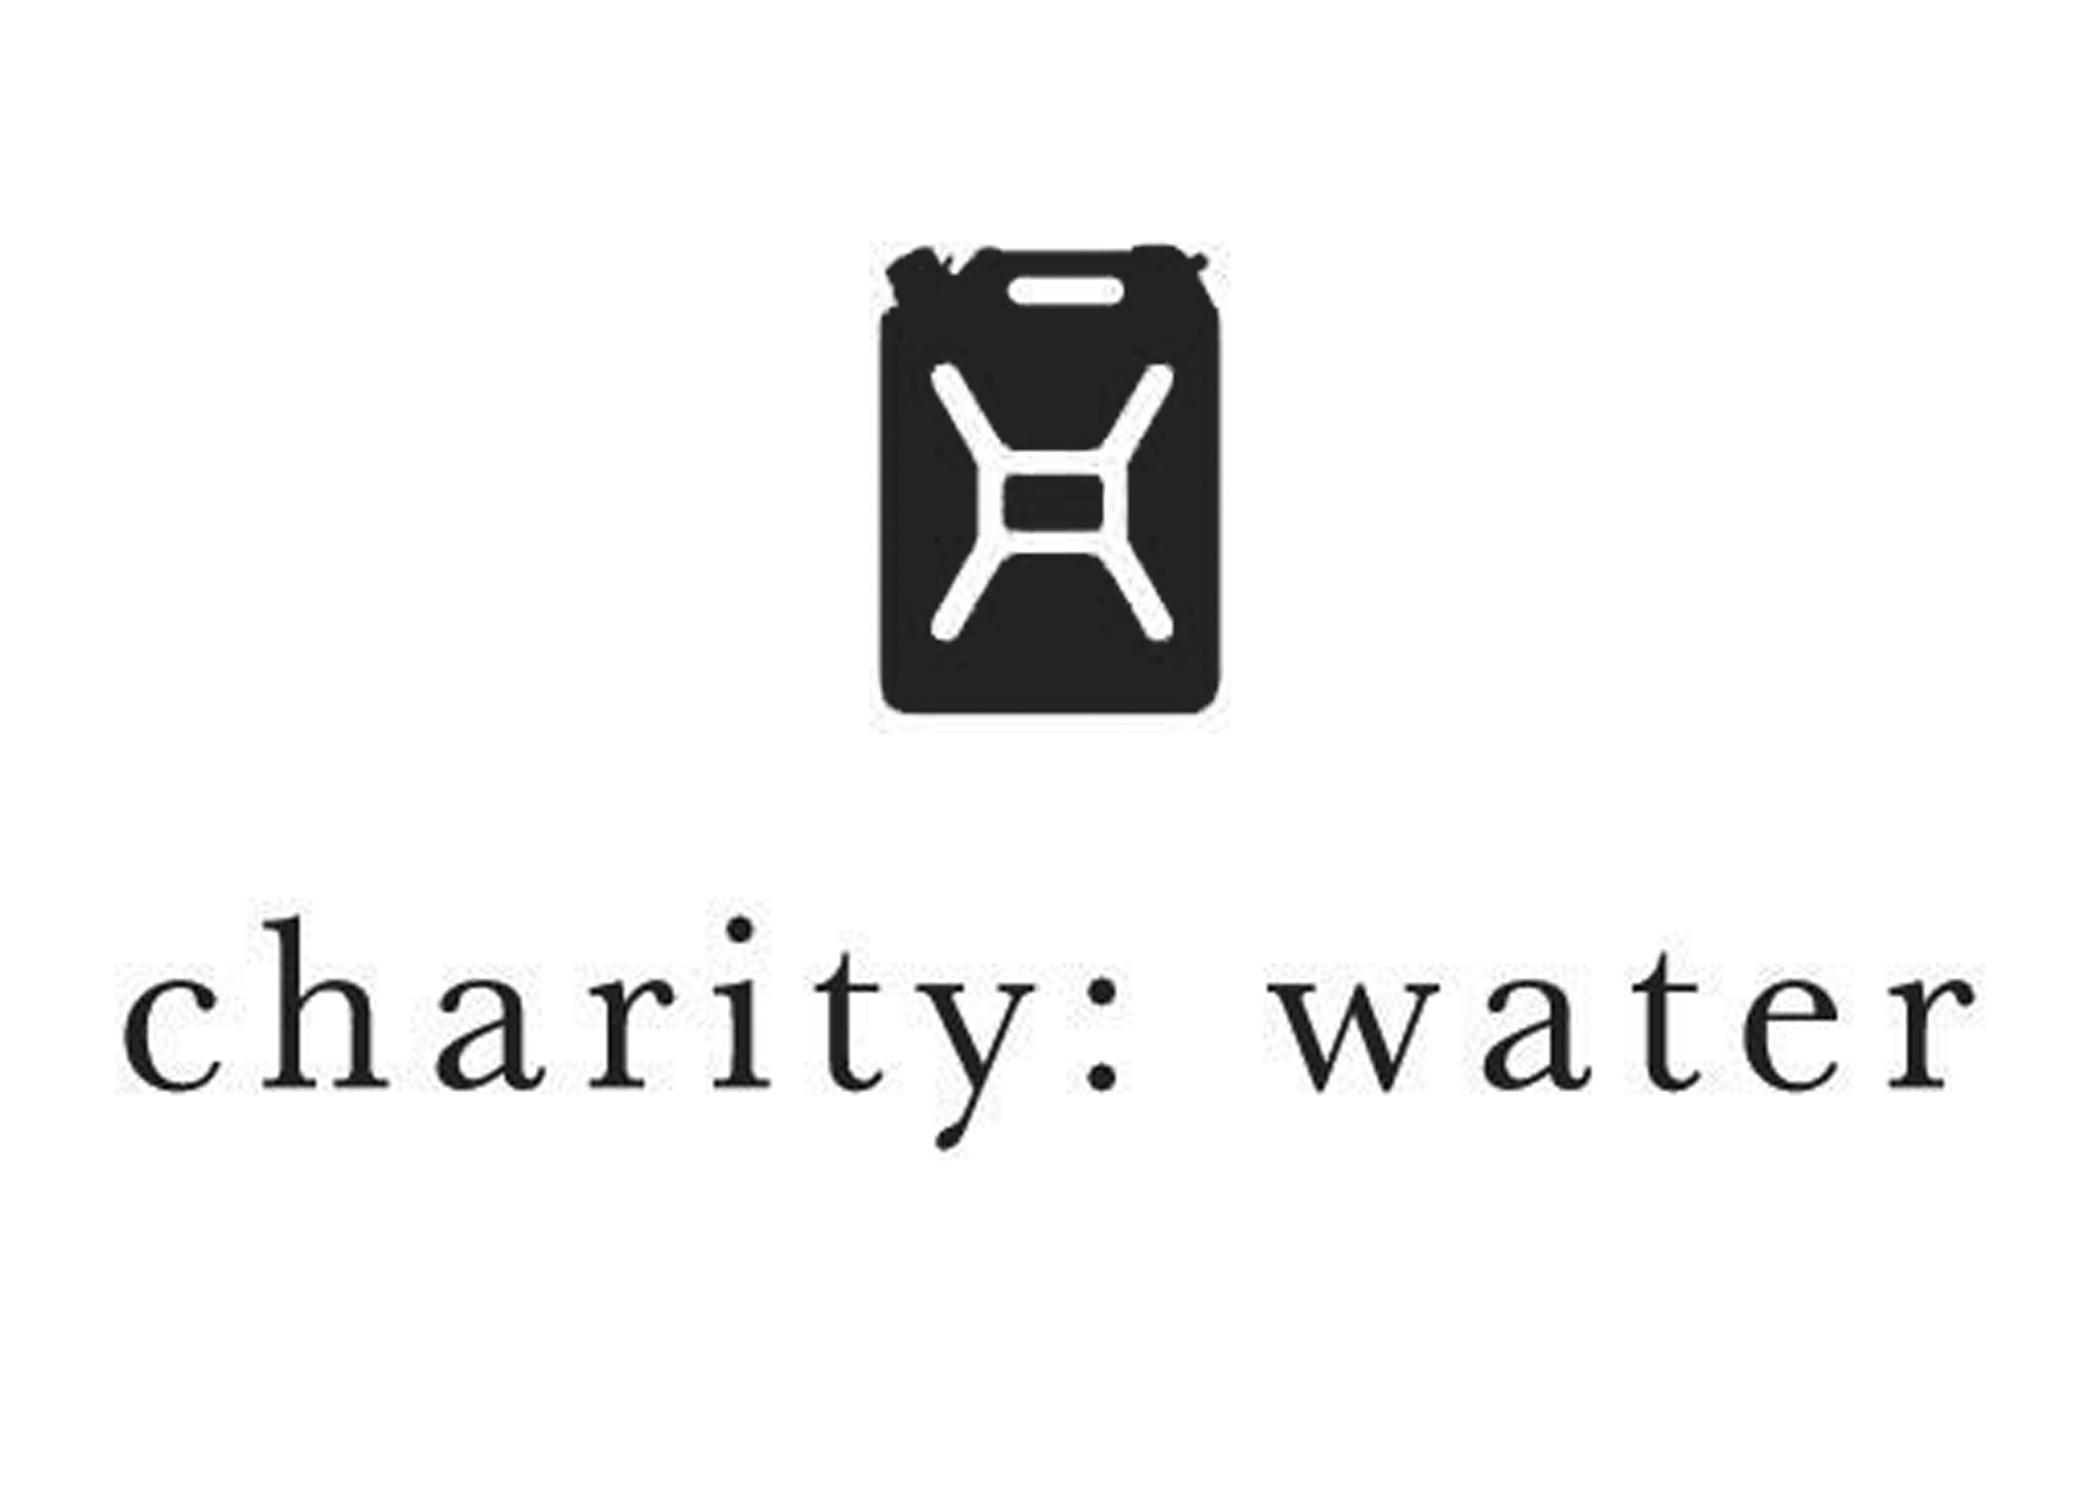 charity- water.jpg